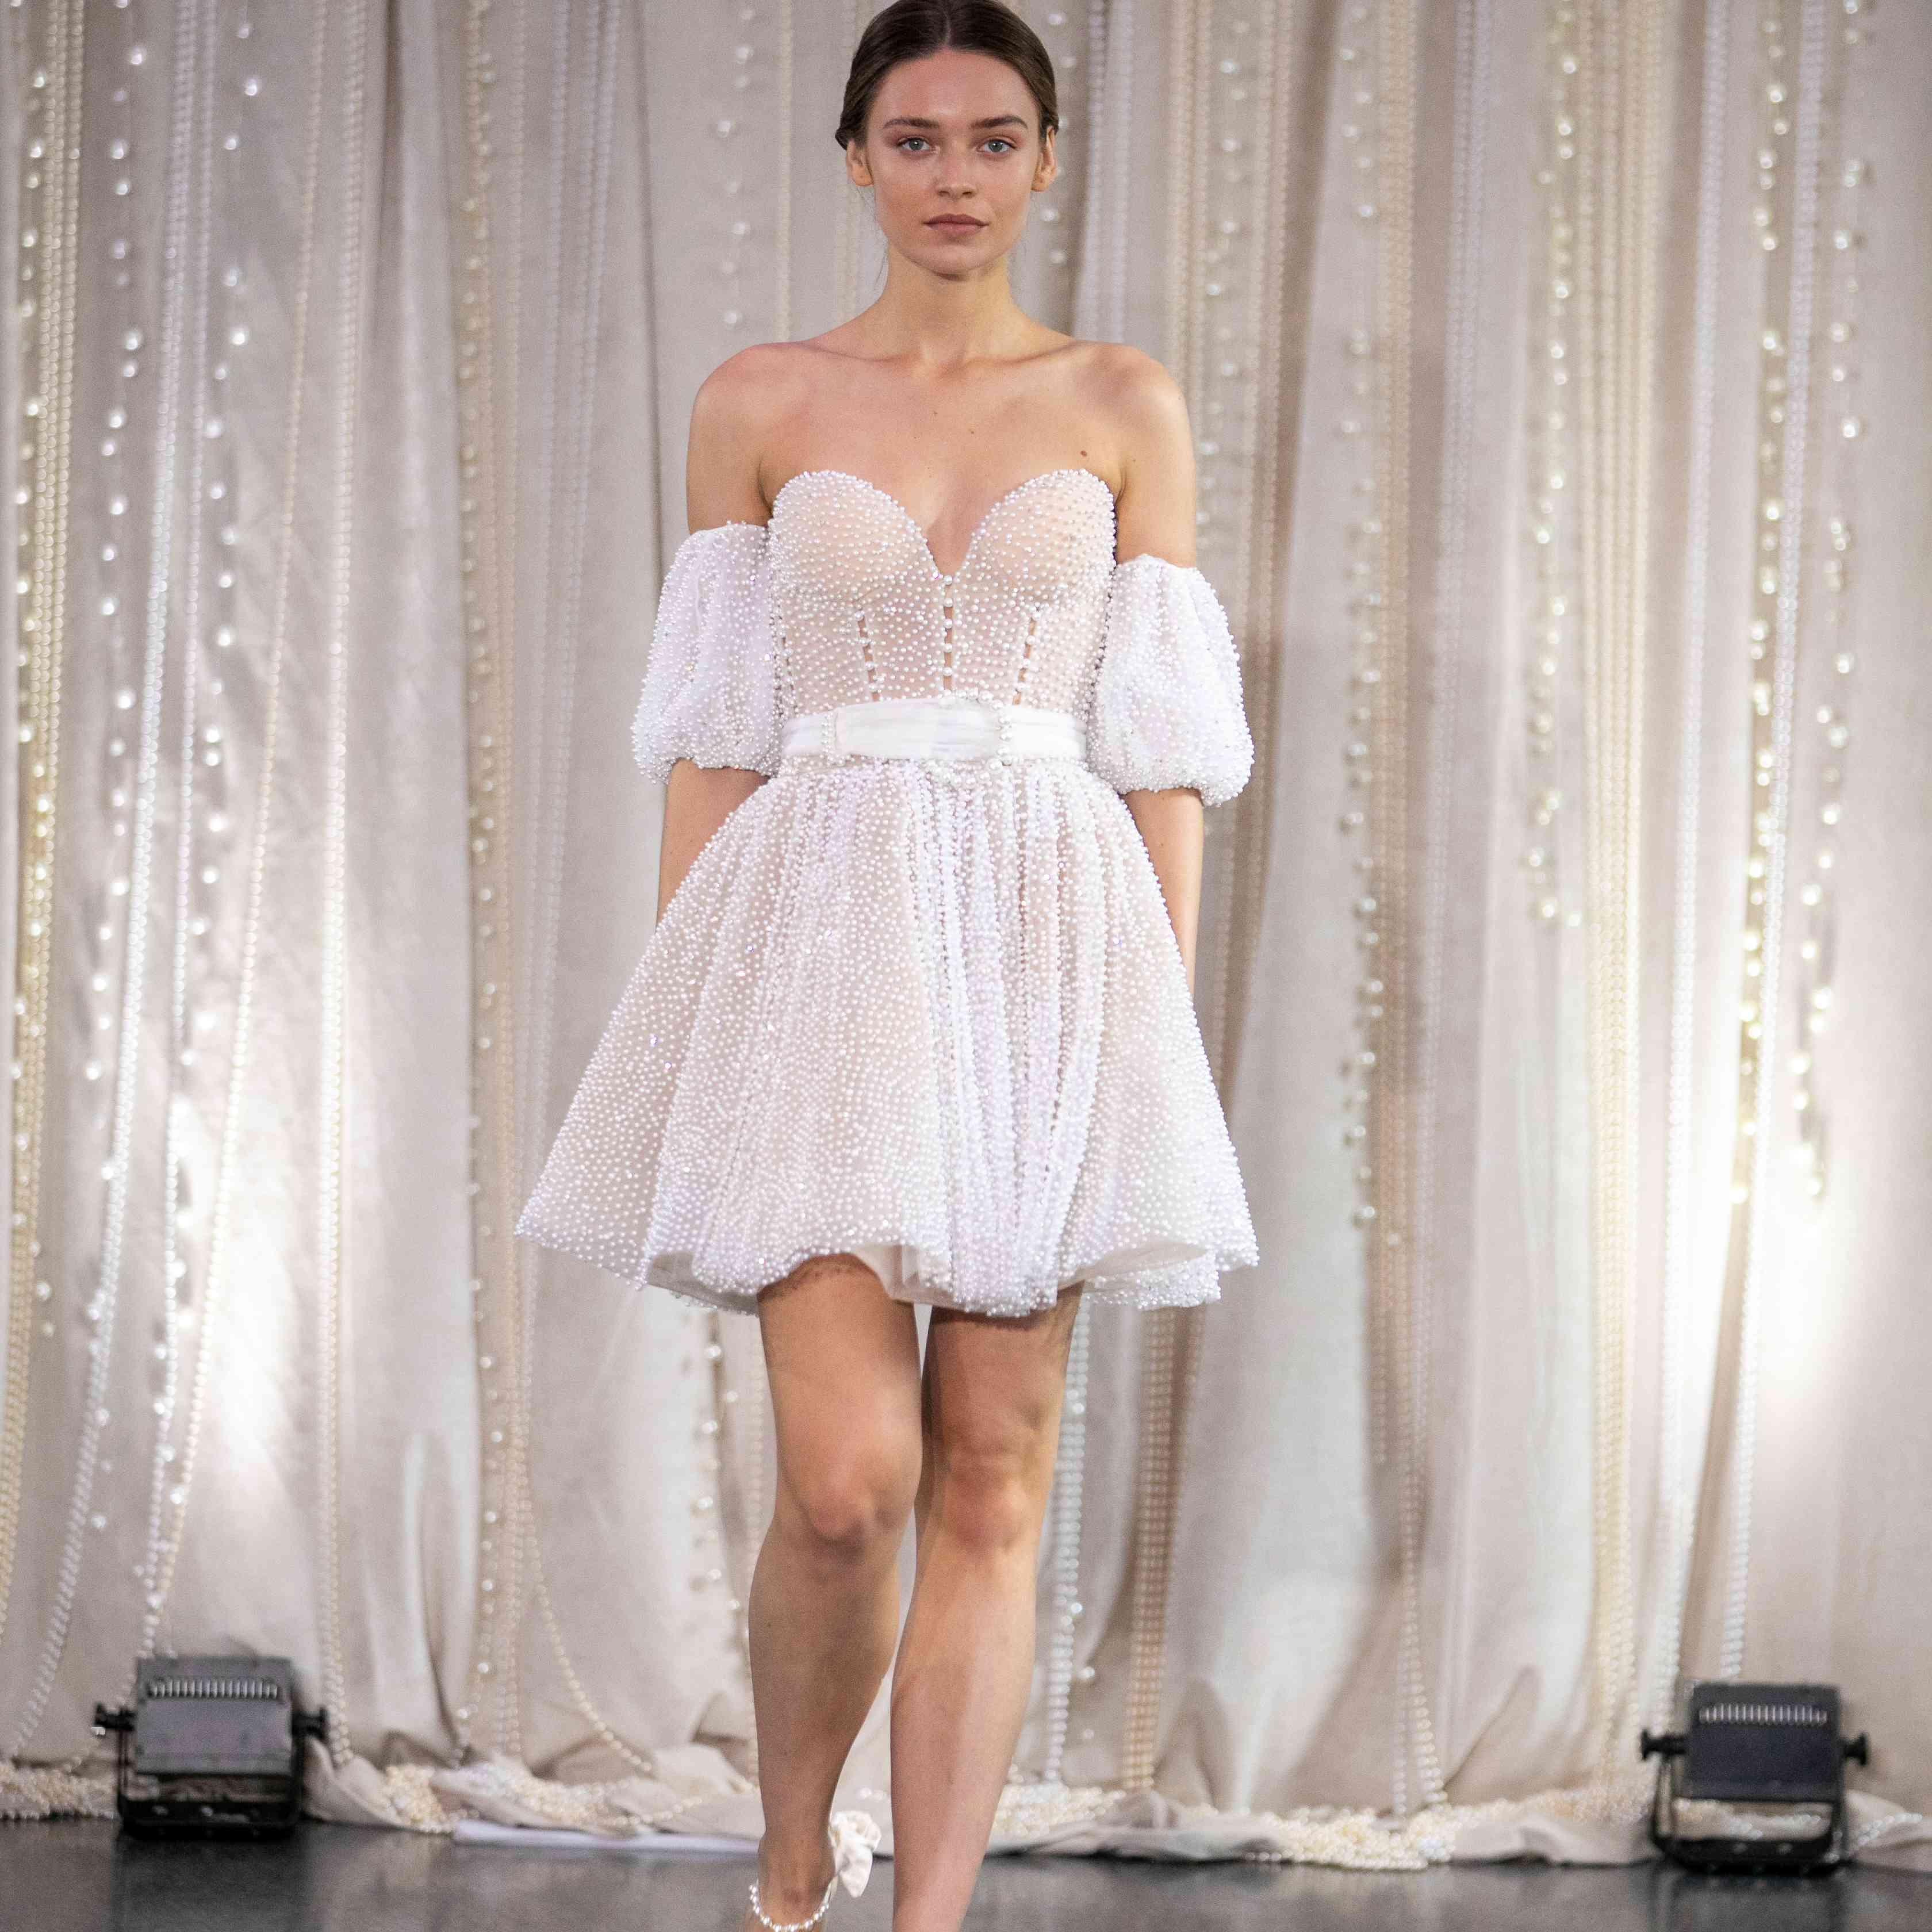 Model in off-the-shoulder mini wedding dress